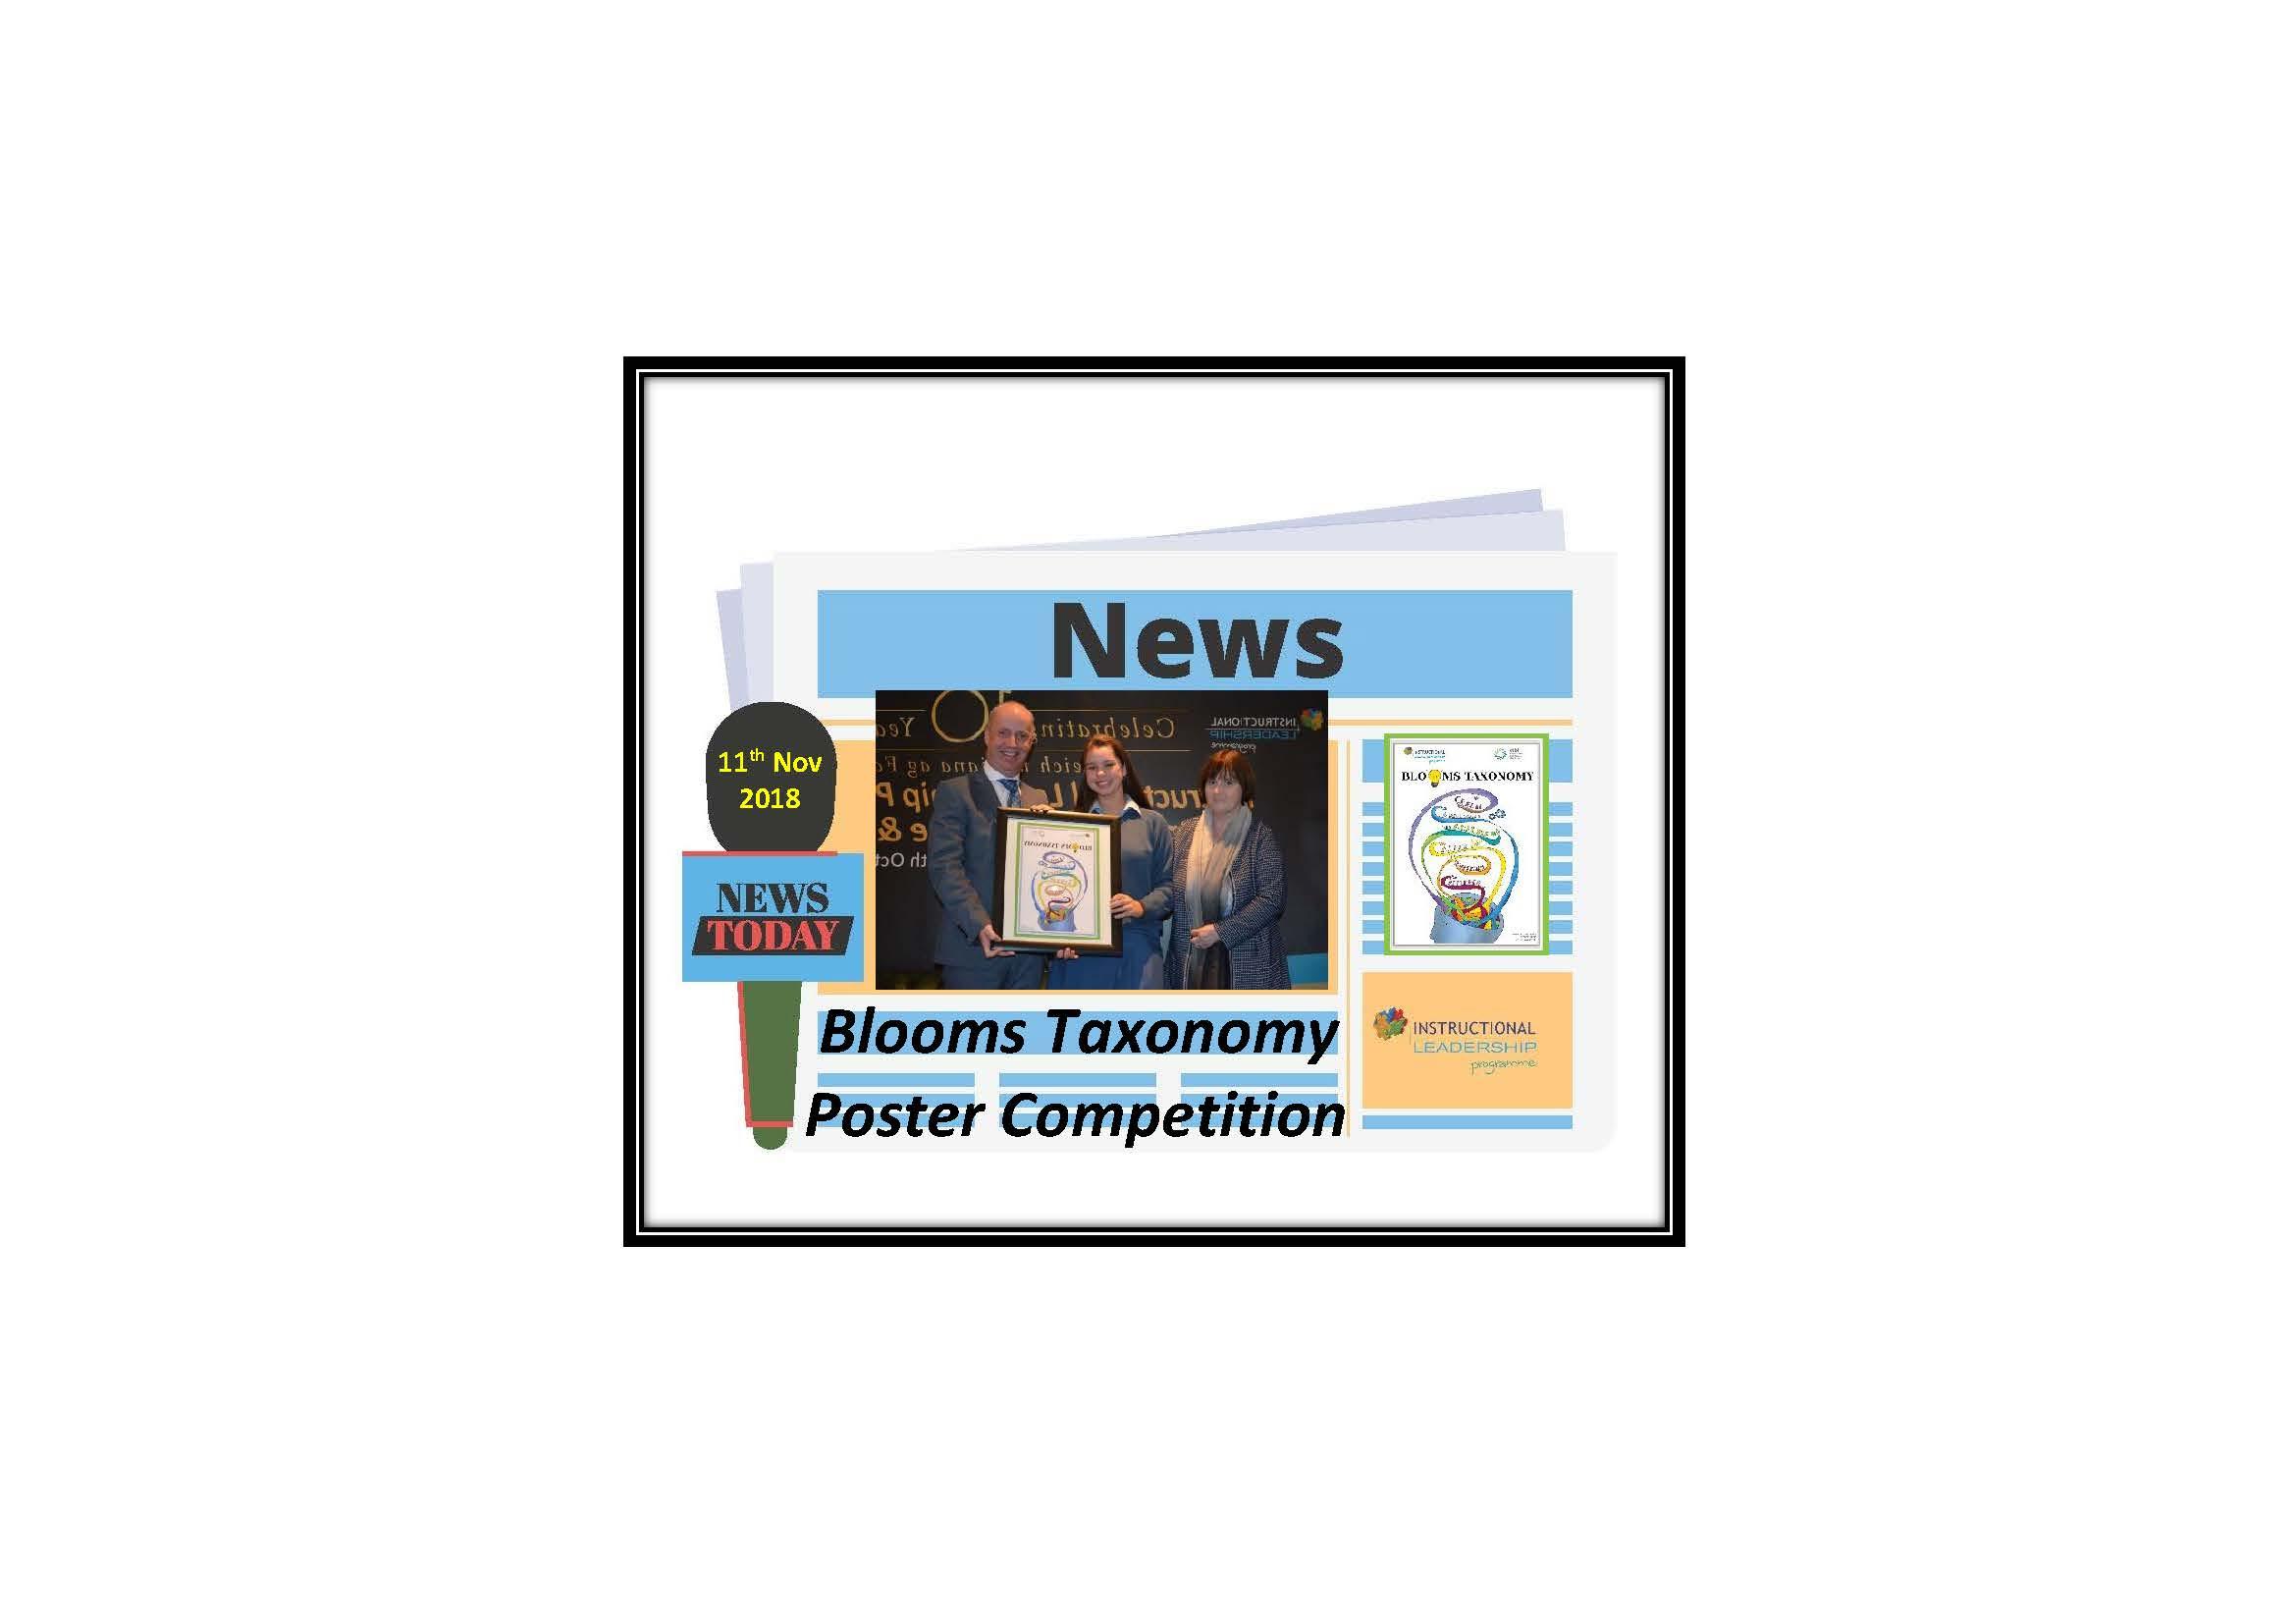 Blooms Taxonomy Presentation